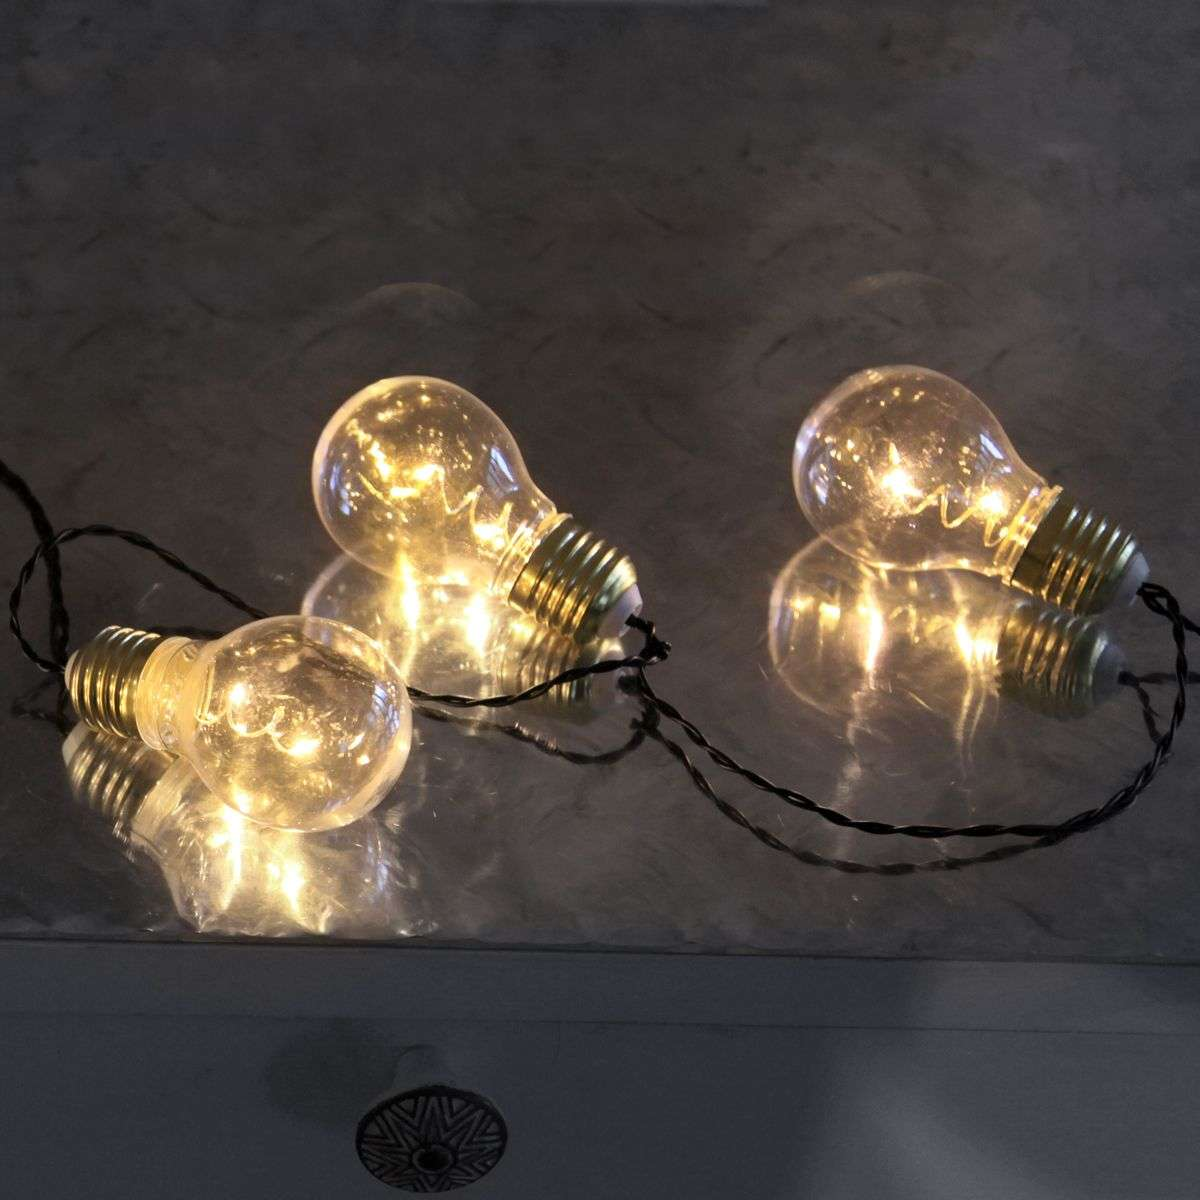 tulum patio light string lighting co smsender lights battery